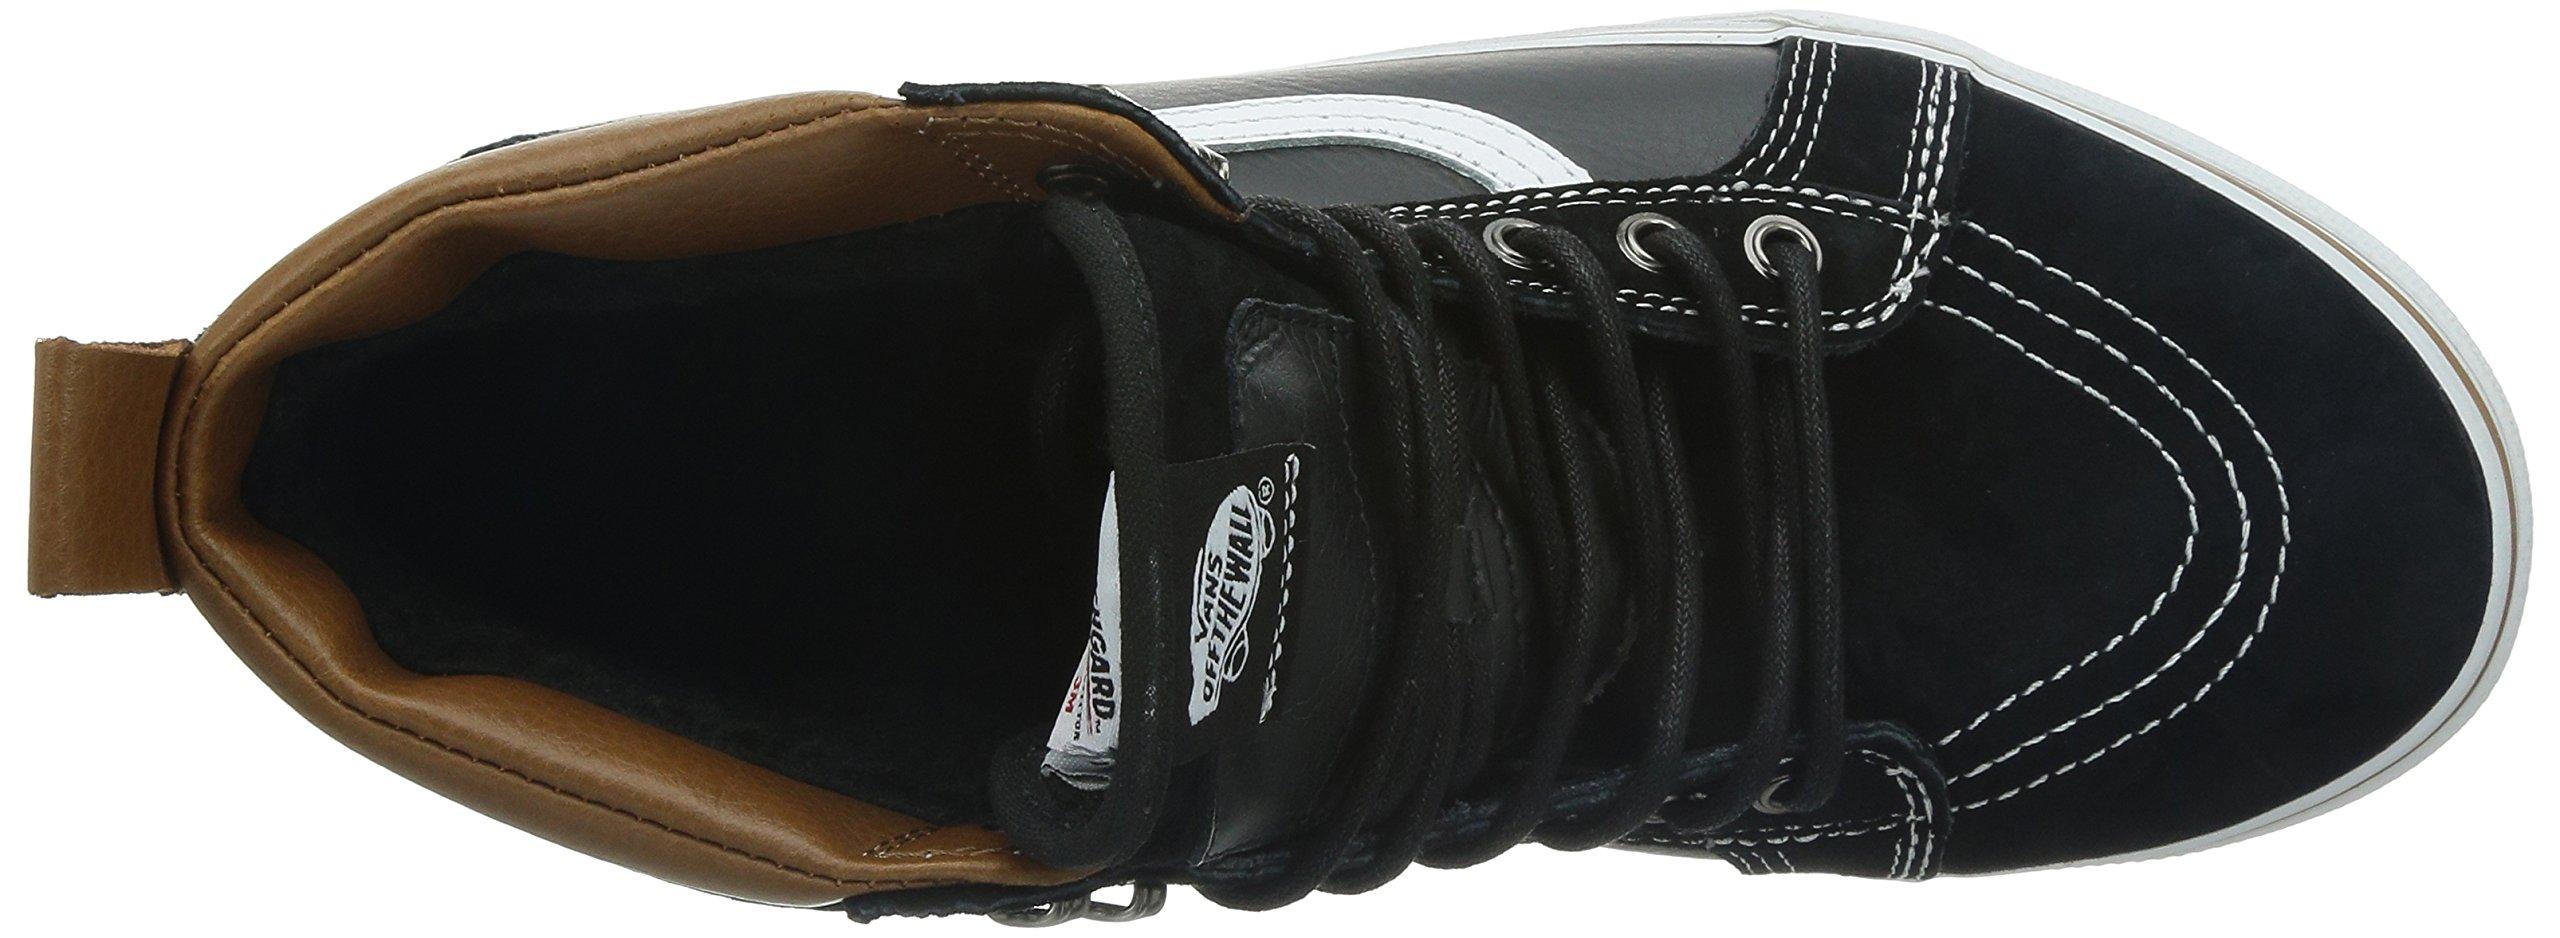 Vans Unisex Sk8-Hi MTE (MTE) Black/True White Skate Shoe 8.5 Men US/10 Women US by Vans (Image #8)